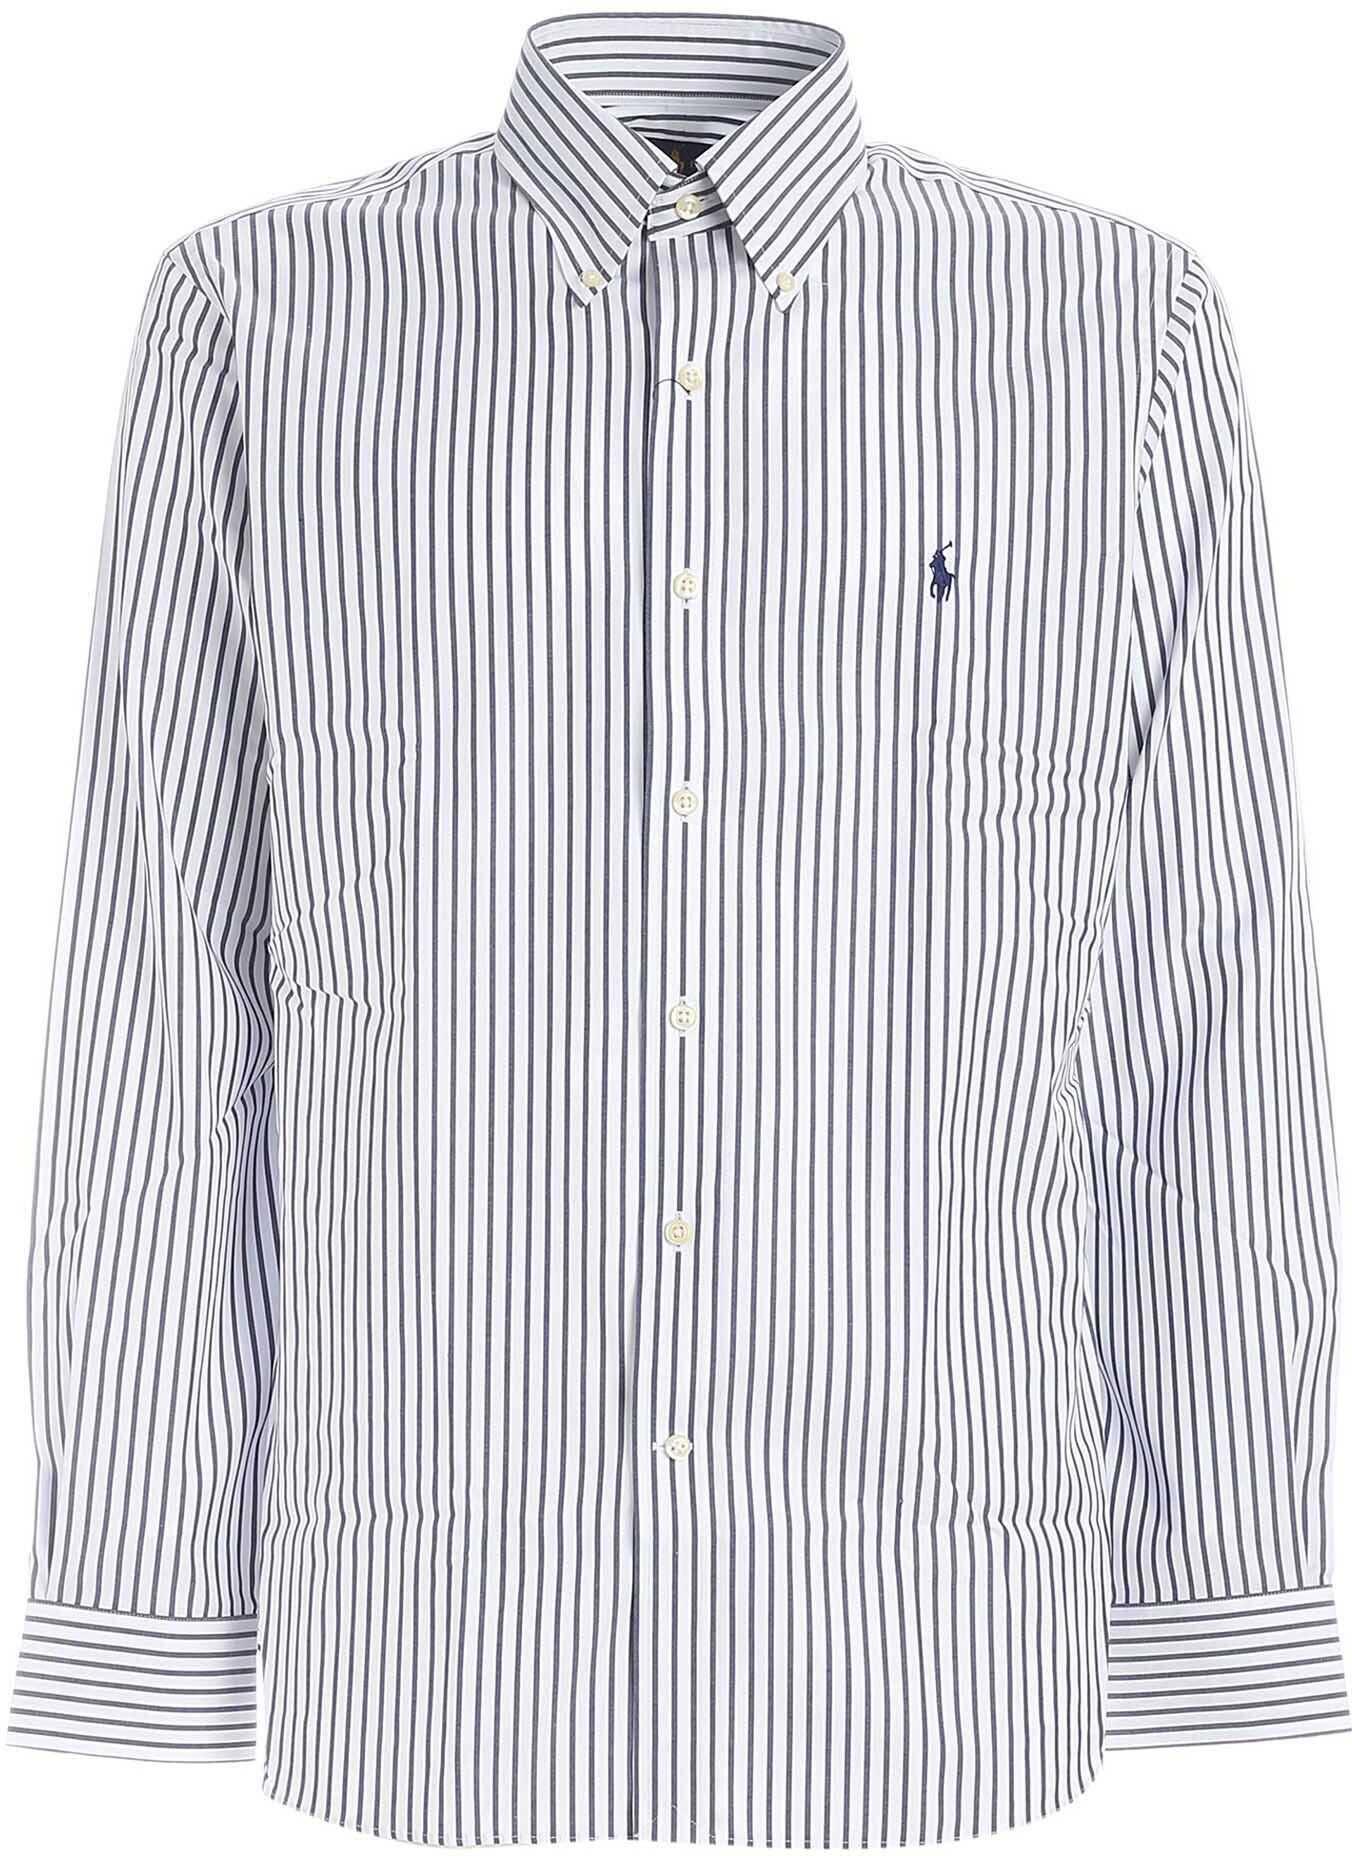 Ralph Lauren Logo Stripes Shirt In White And Blue White imagine